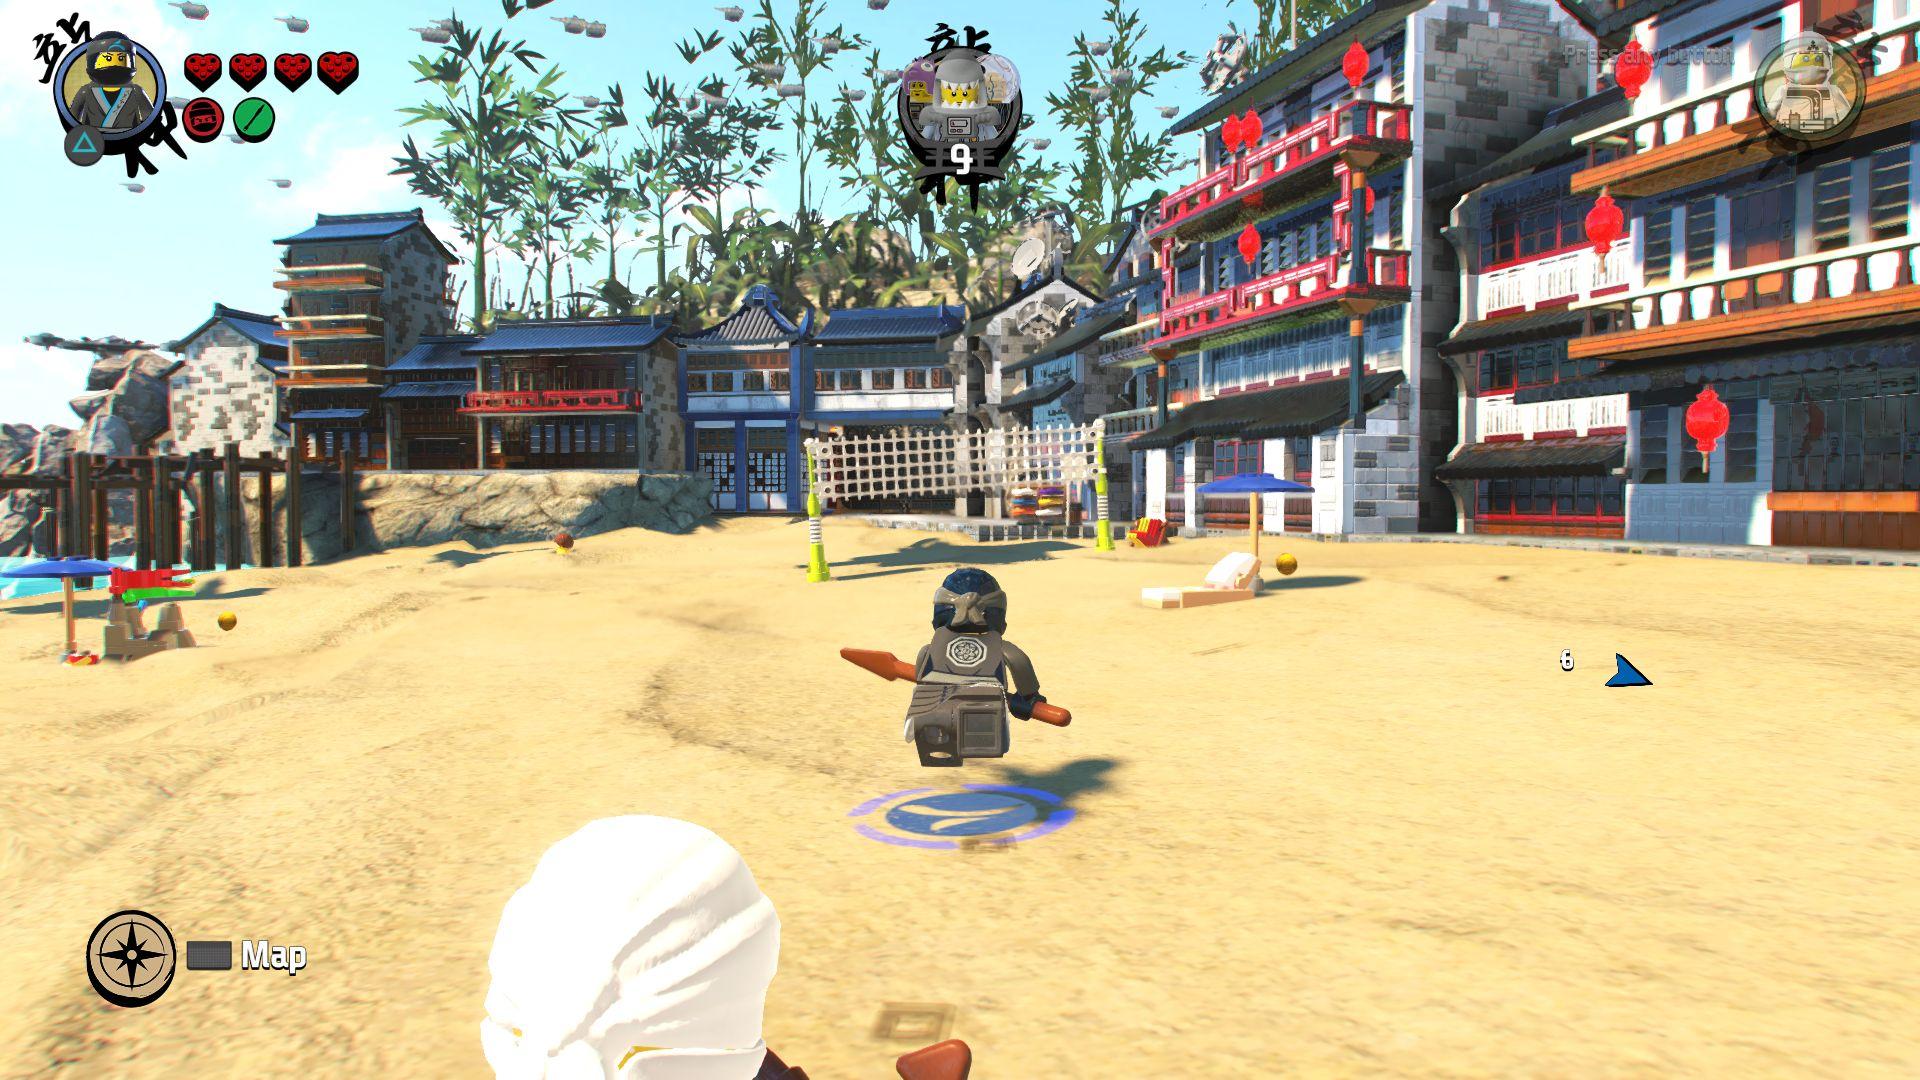 LEGO Ninjago Movie Video Game - jak se legáček nindžou stal 151106